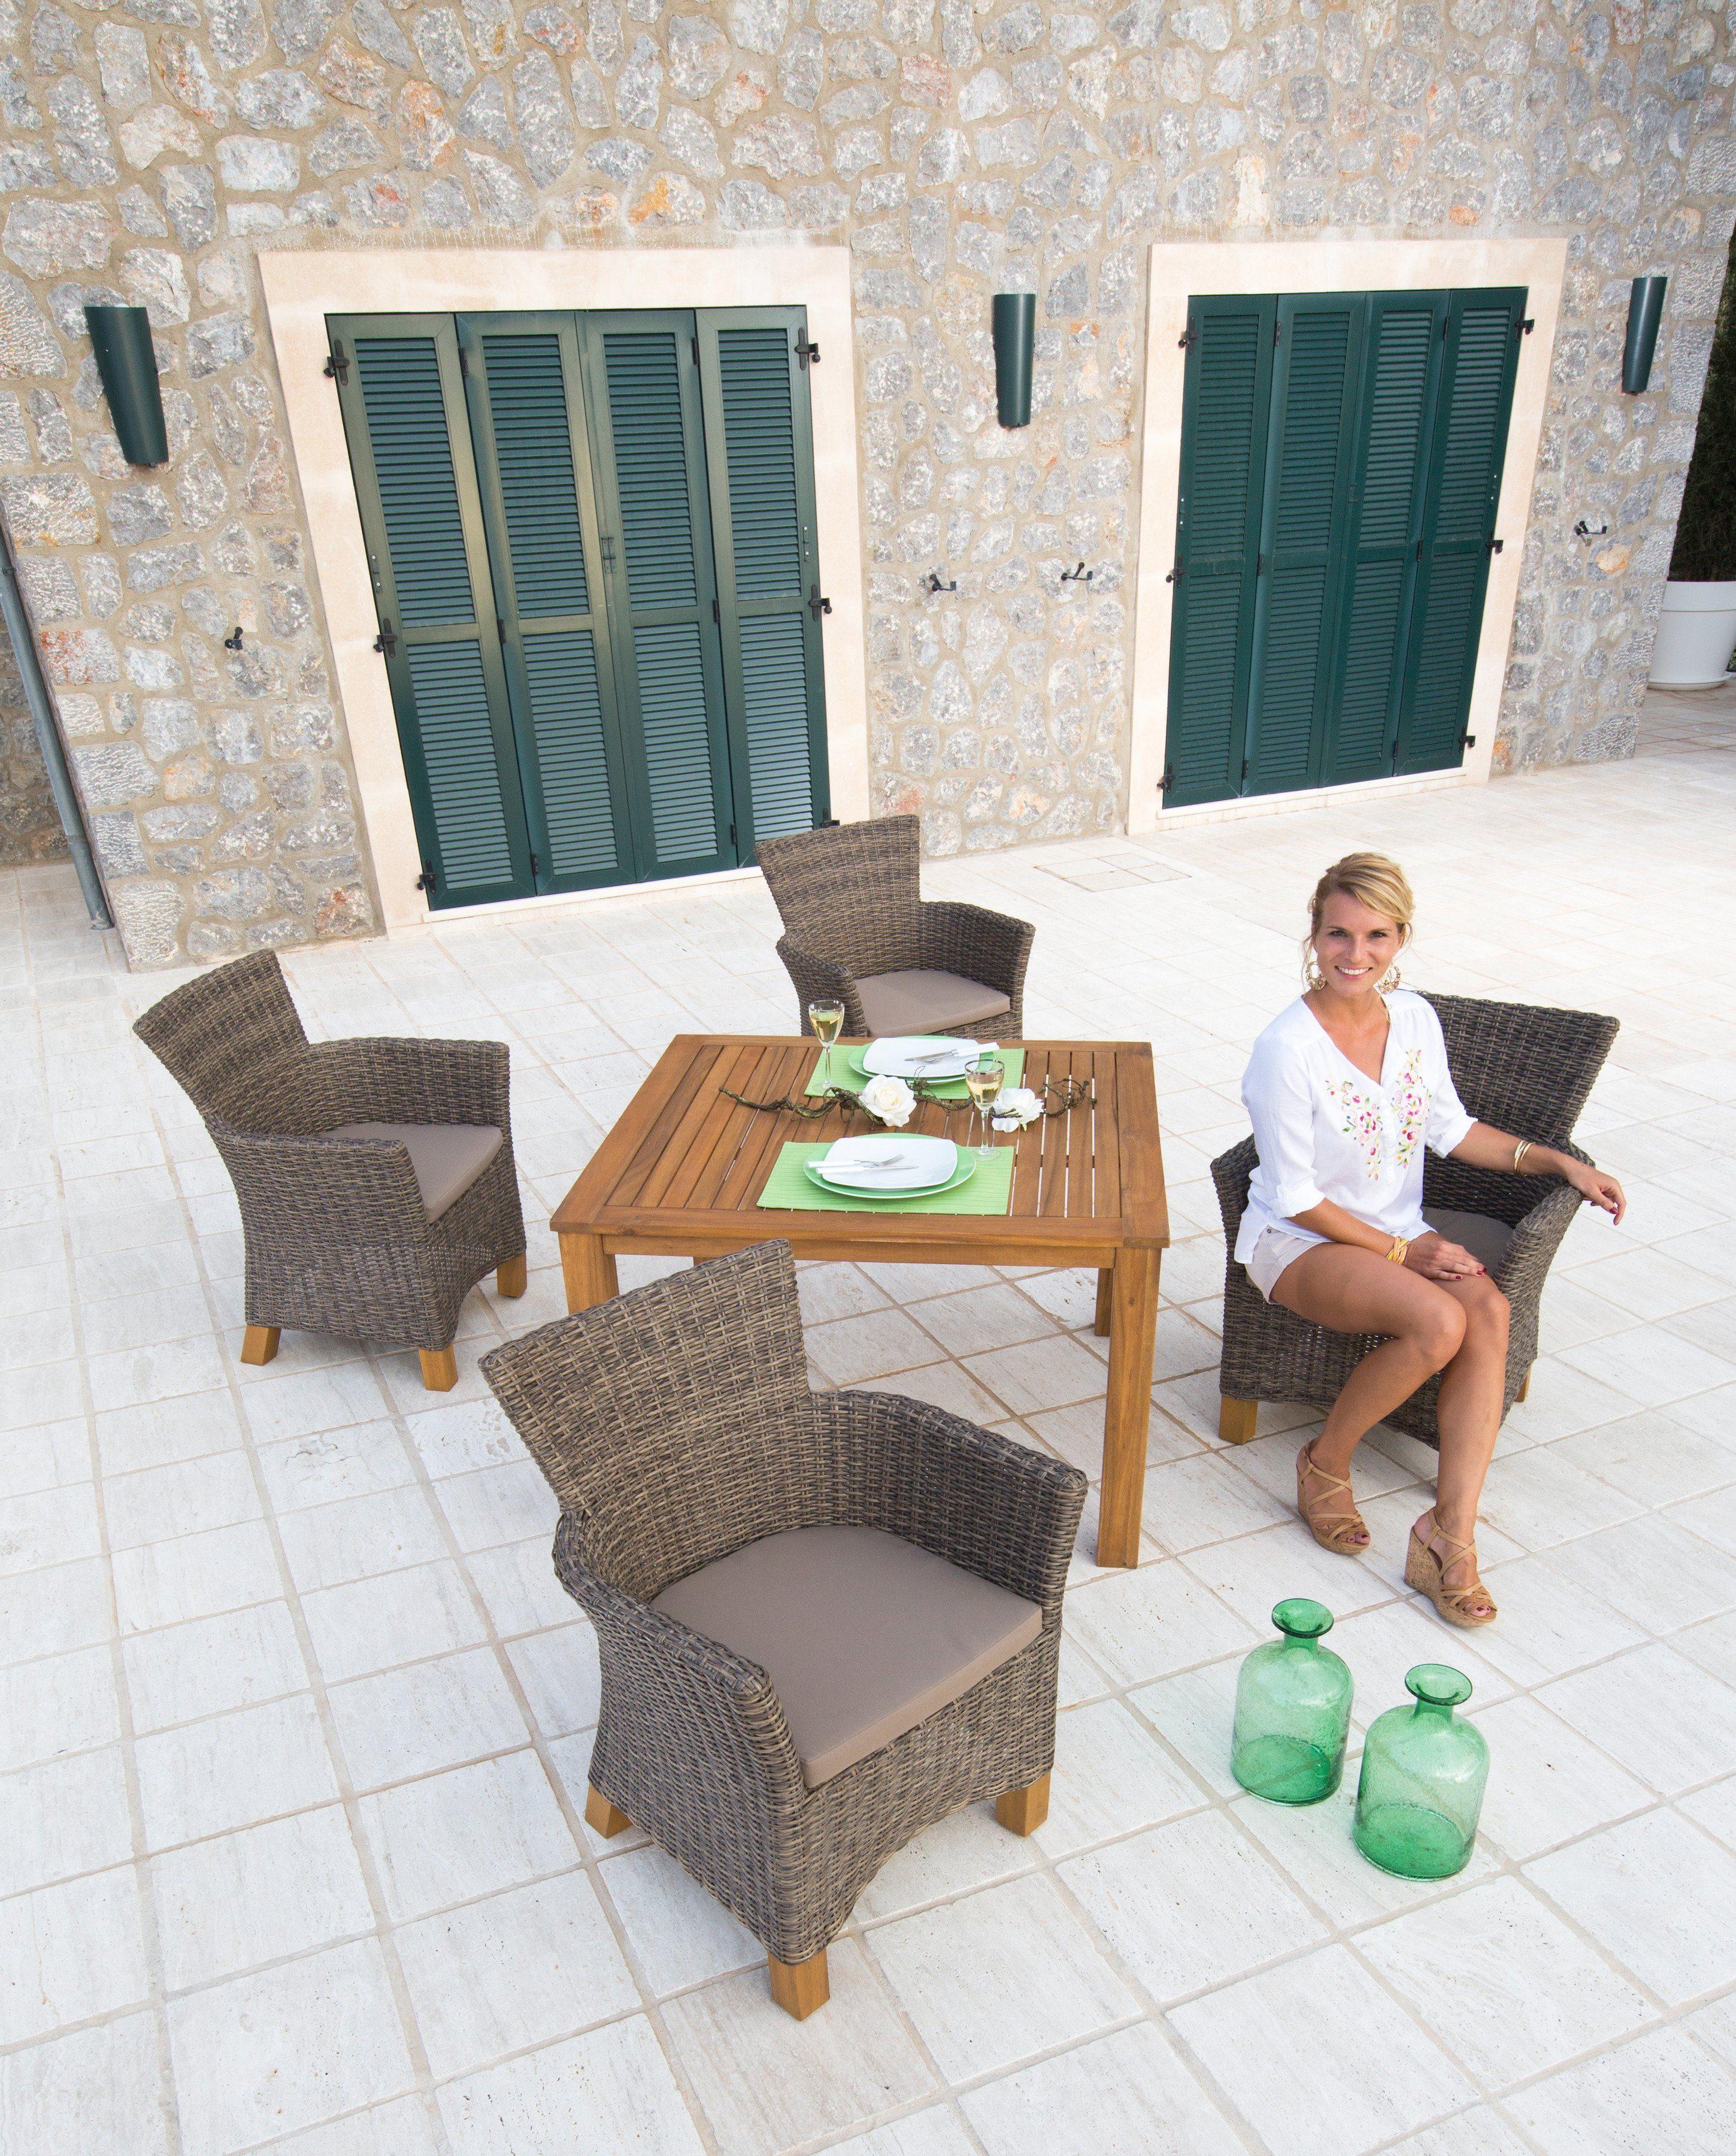 Bequeme Balkonmobel Fur Kleinen Balkon :  tgl, 4 Sessel, Tisch 110×100 cm, PolyrattanAkazienholz in hellbraun